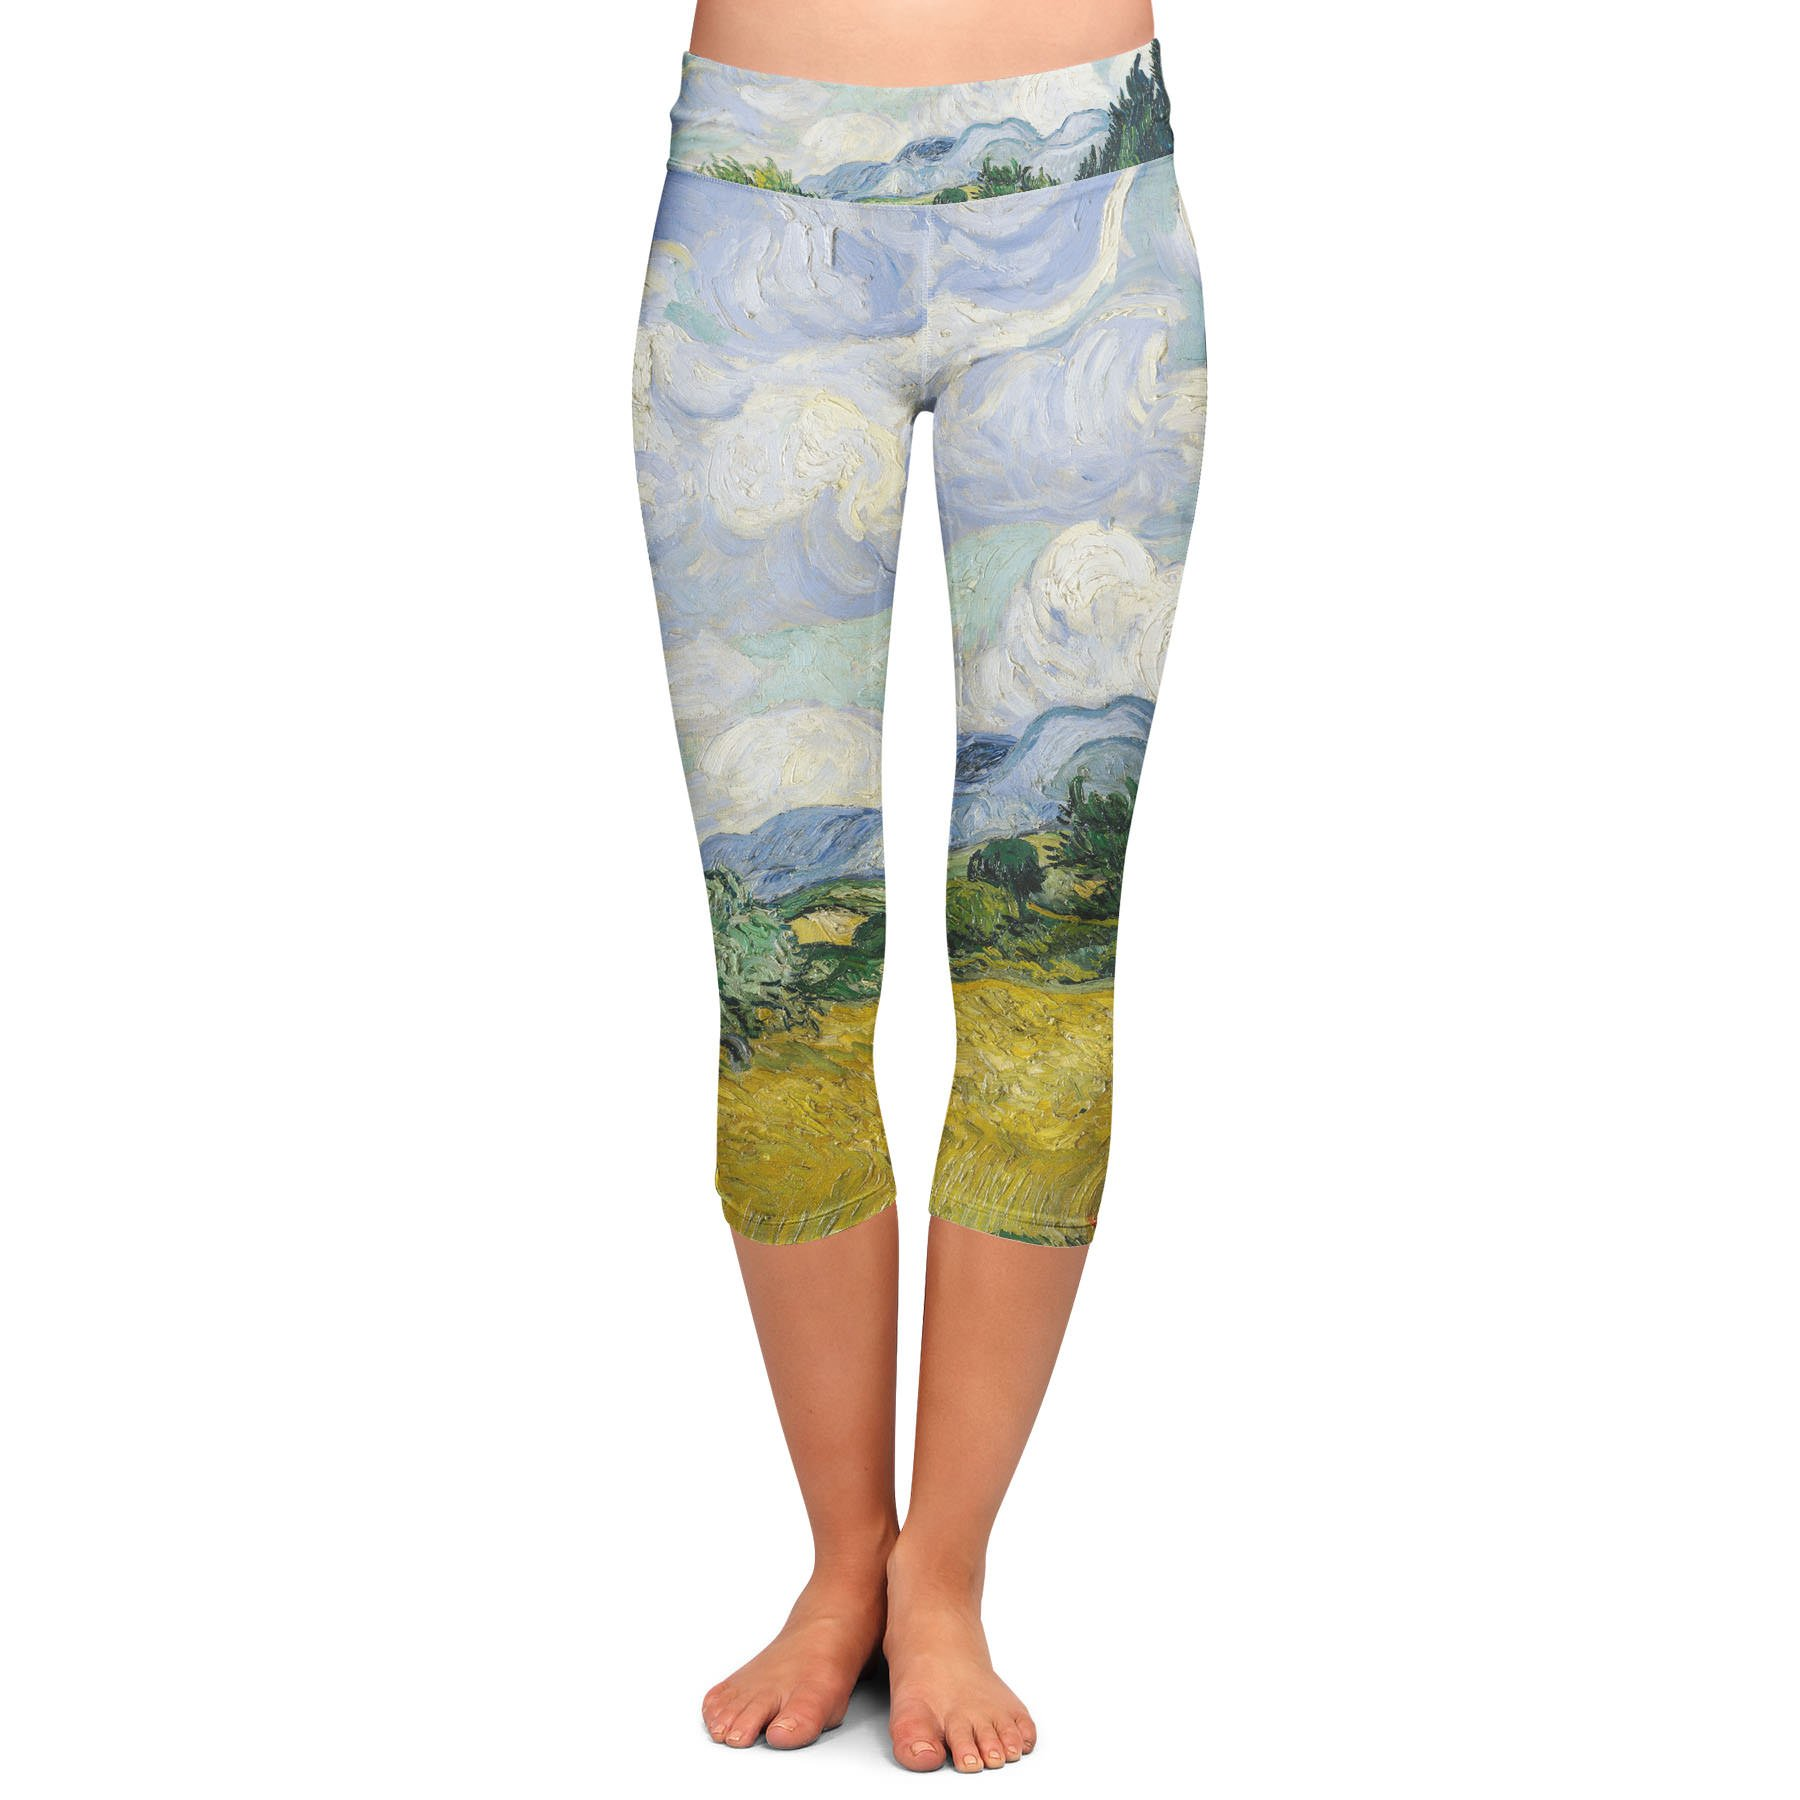 Vincent Van Gogh Fine Art Painting Yoga Leggings - Capri 3/4 Length, Low Waist by Queen of Cases (Image #1)